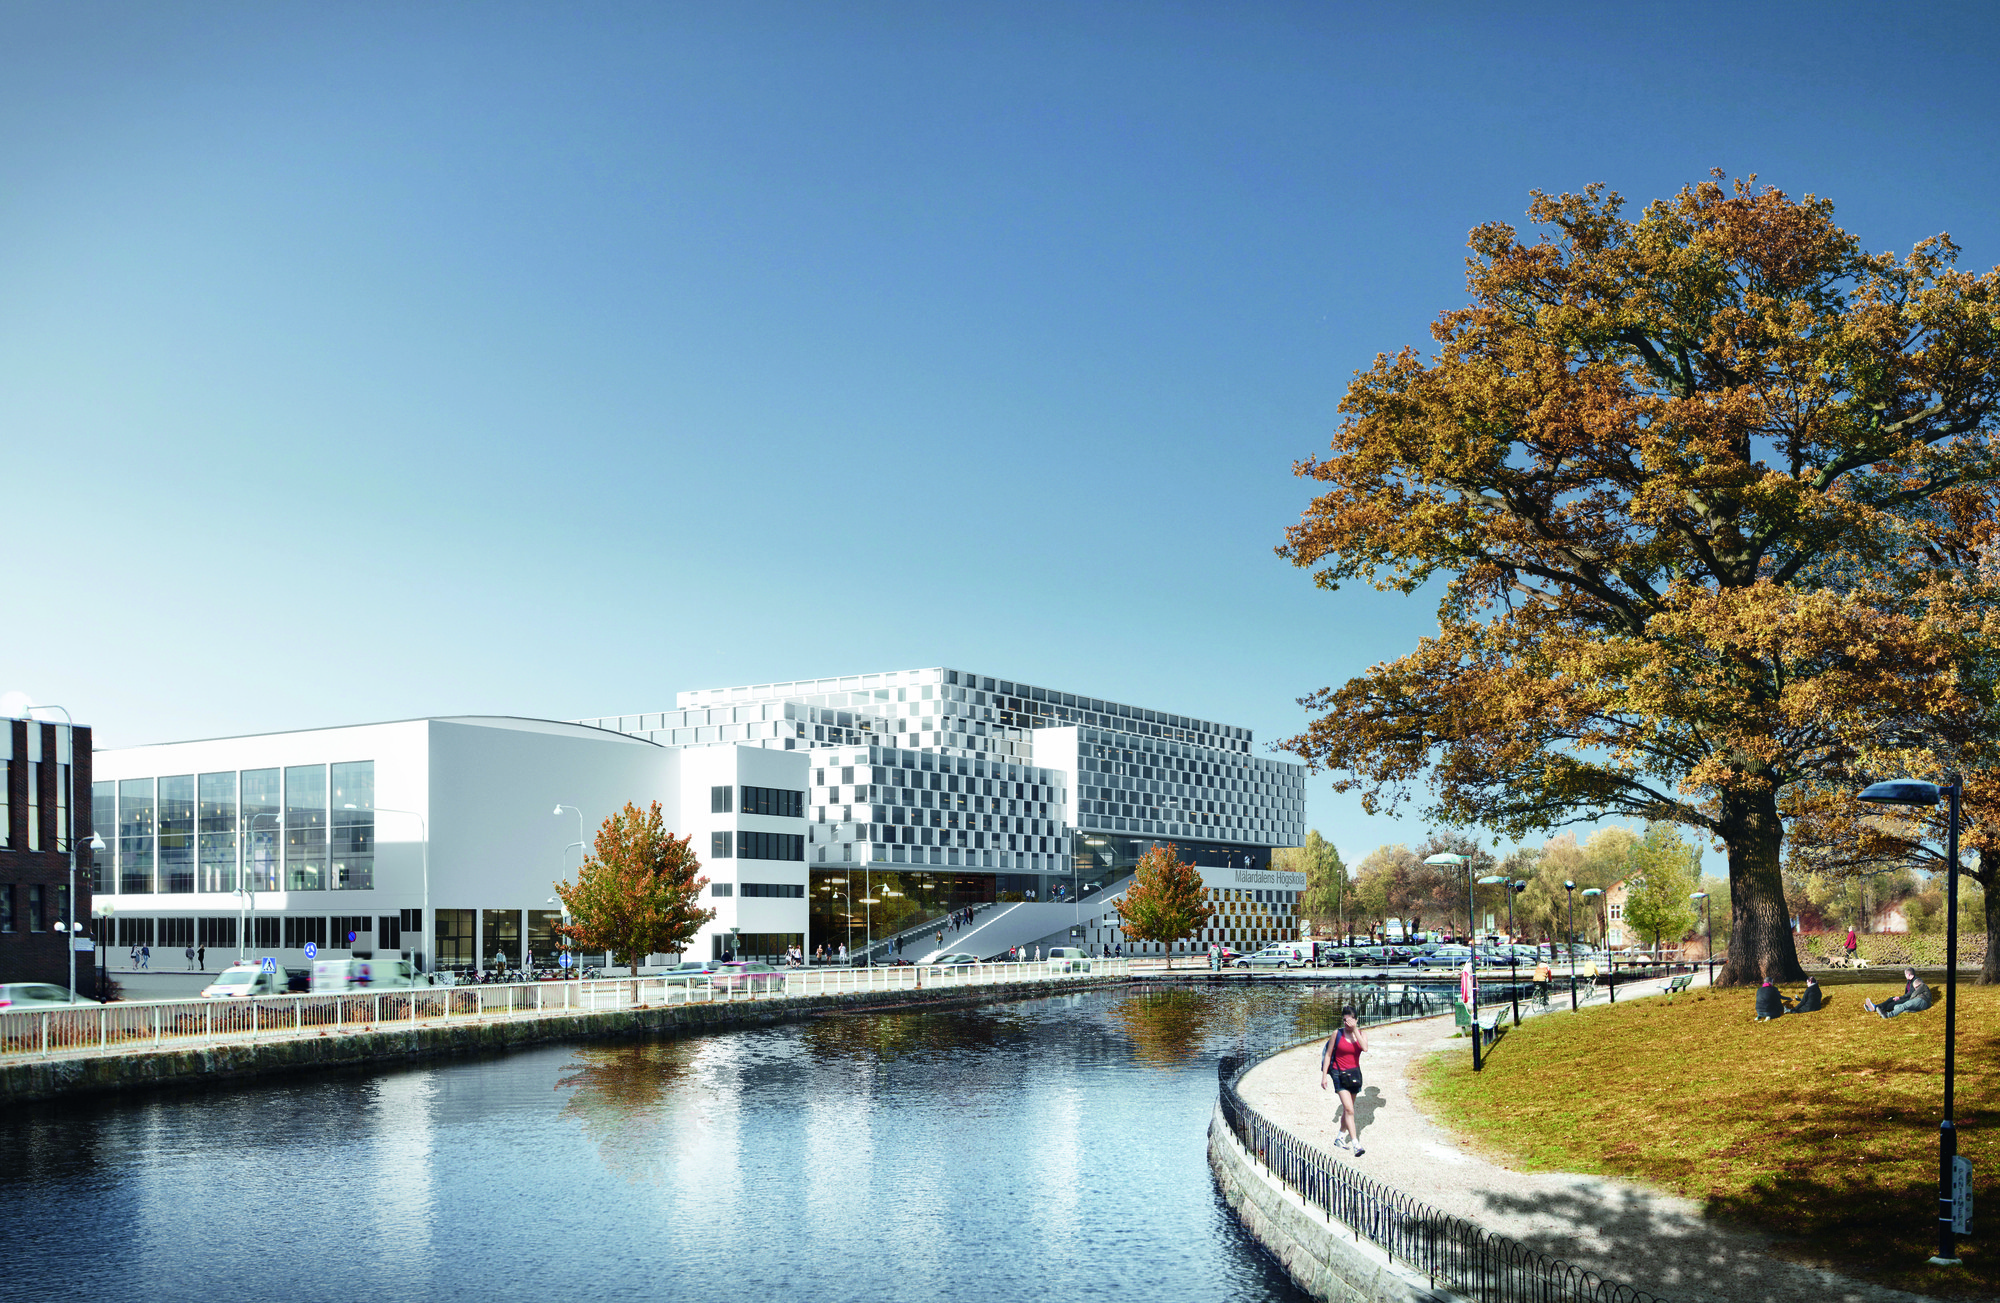 3XN Chosen Over Windgardh, Arkitema to Design University Building in Sweden, © 3XN